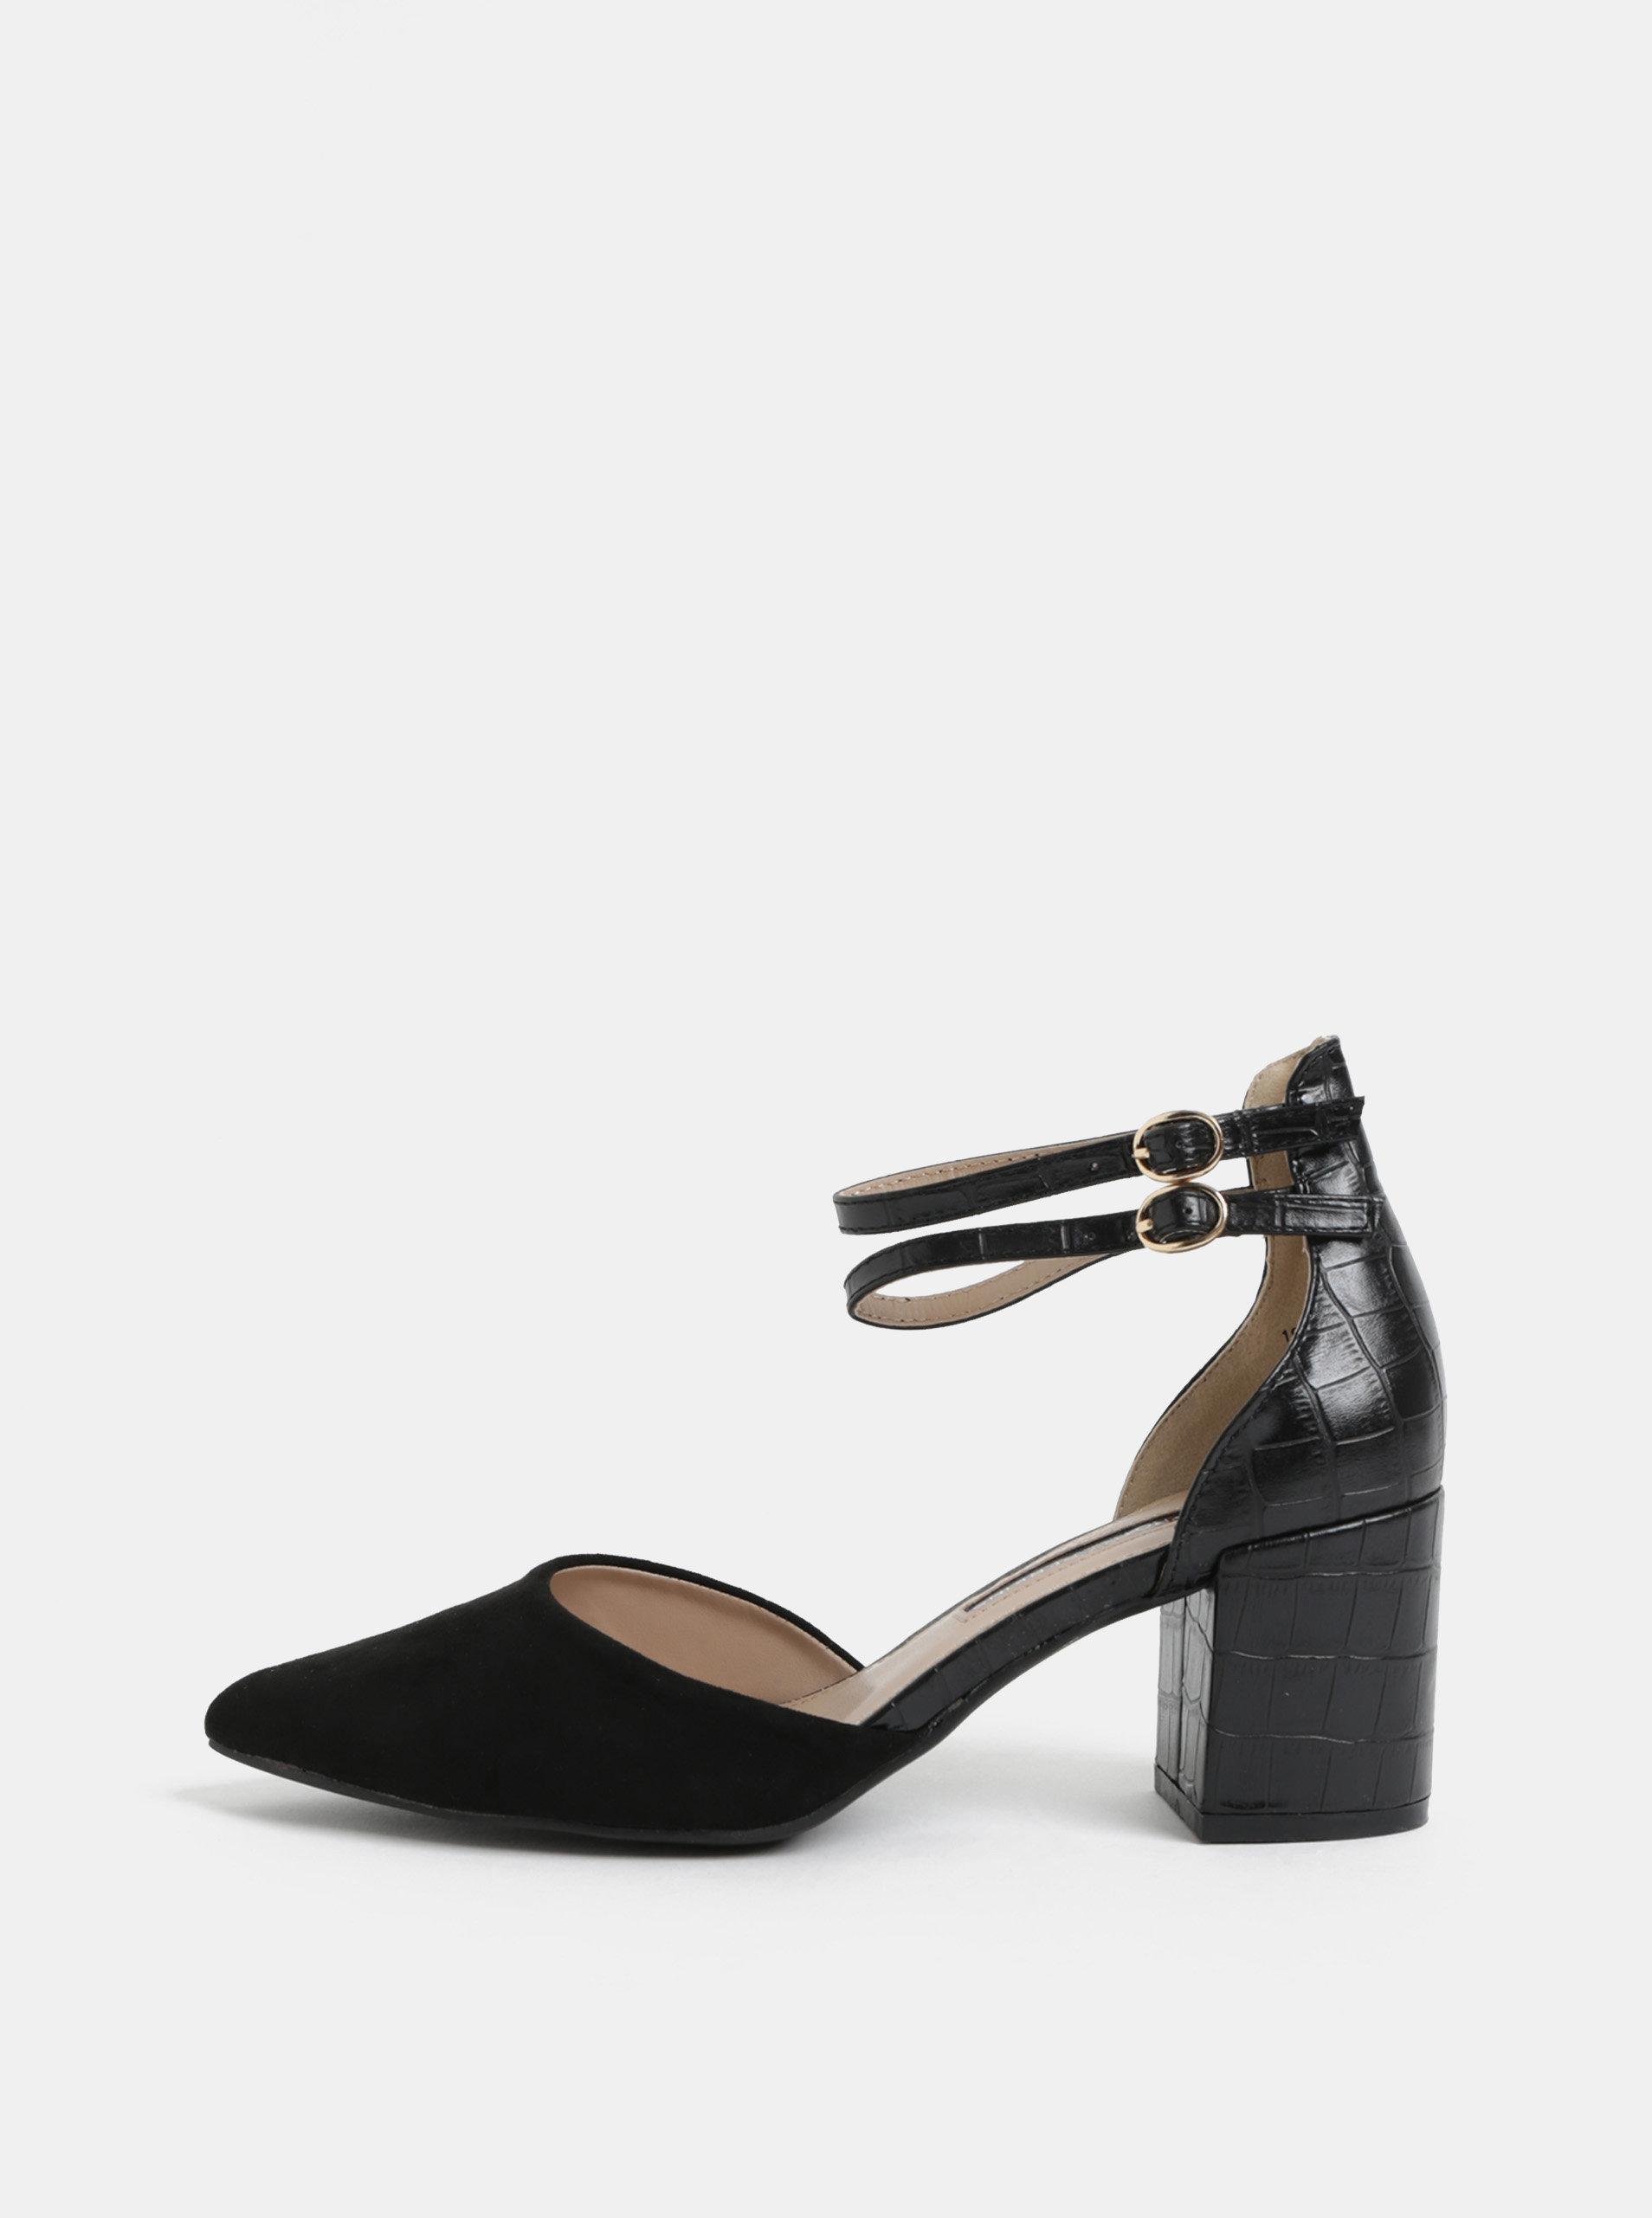 Černé vzorované sandálky se špičkou v semišové úpravě Dorothy Perkins